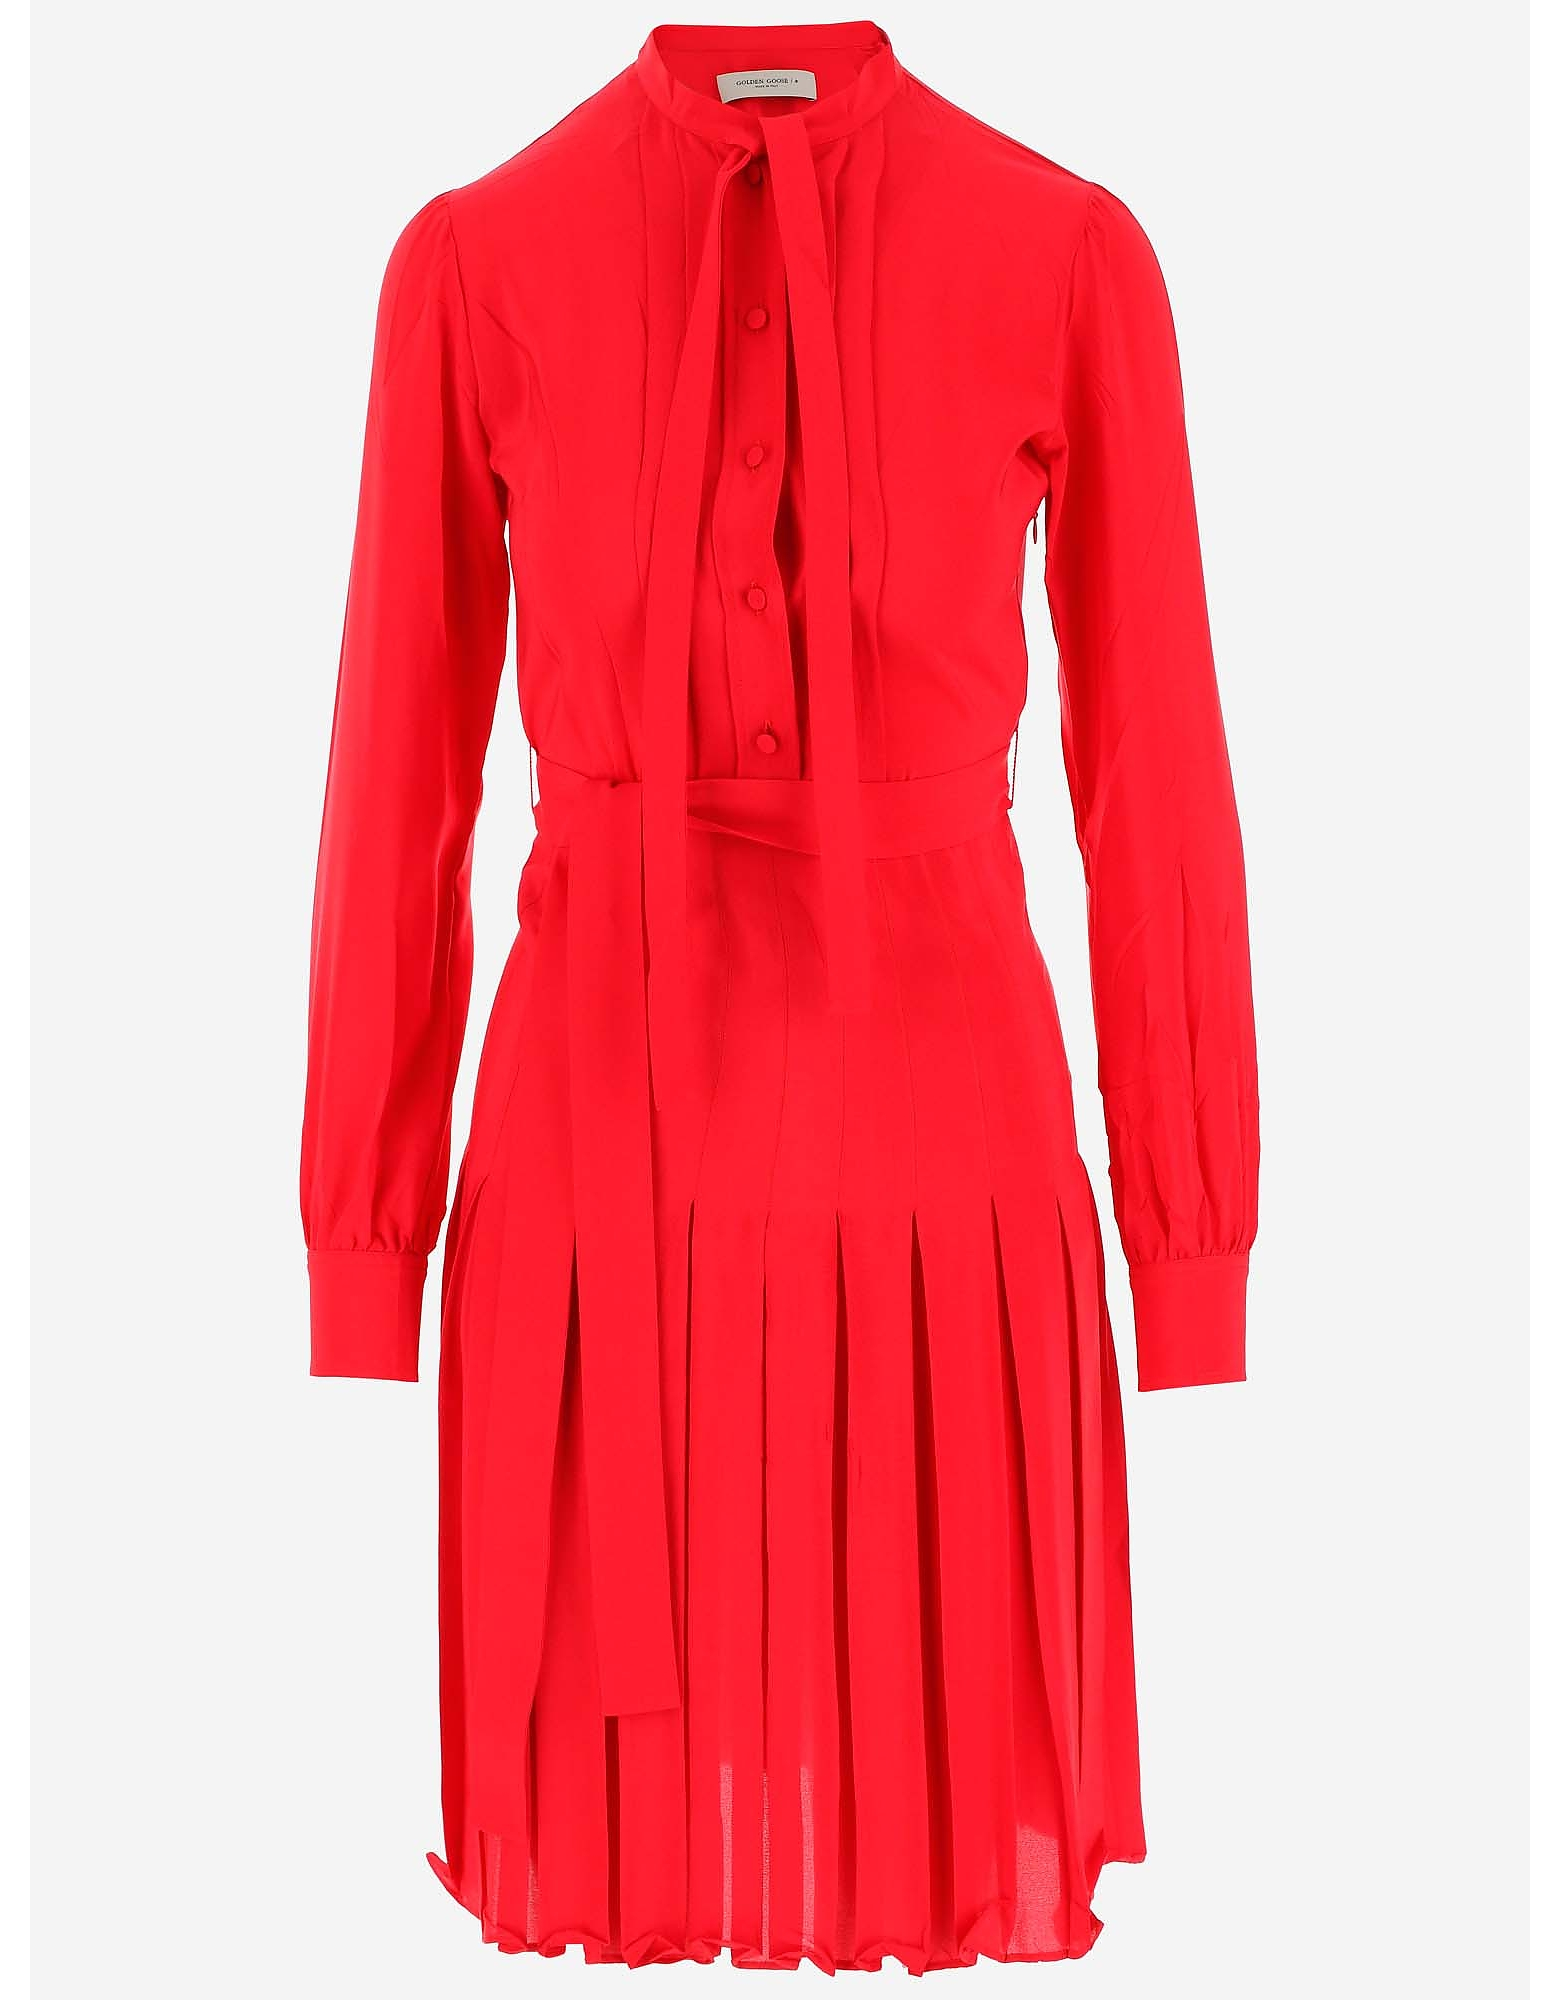 Golden Goose 连衣裙、连衣裤, Pure Red Silk Women's Dress